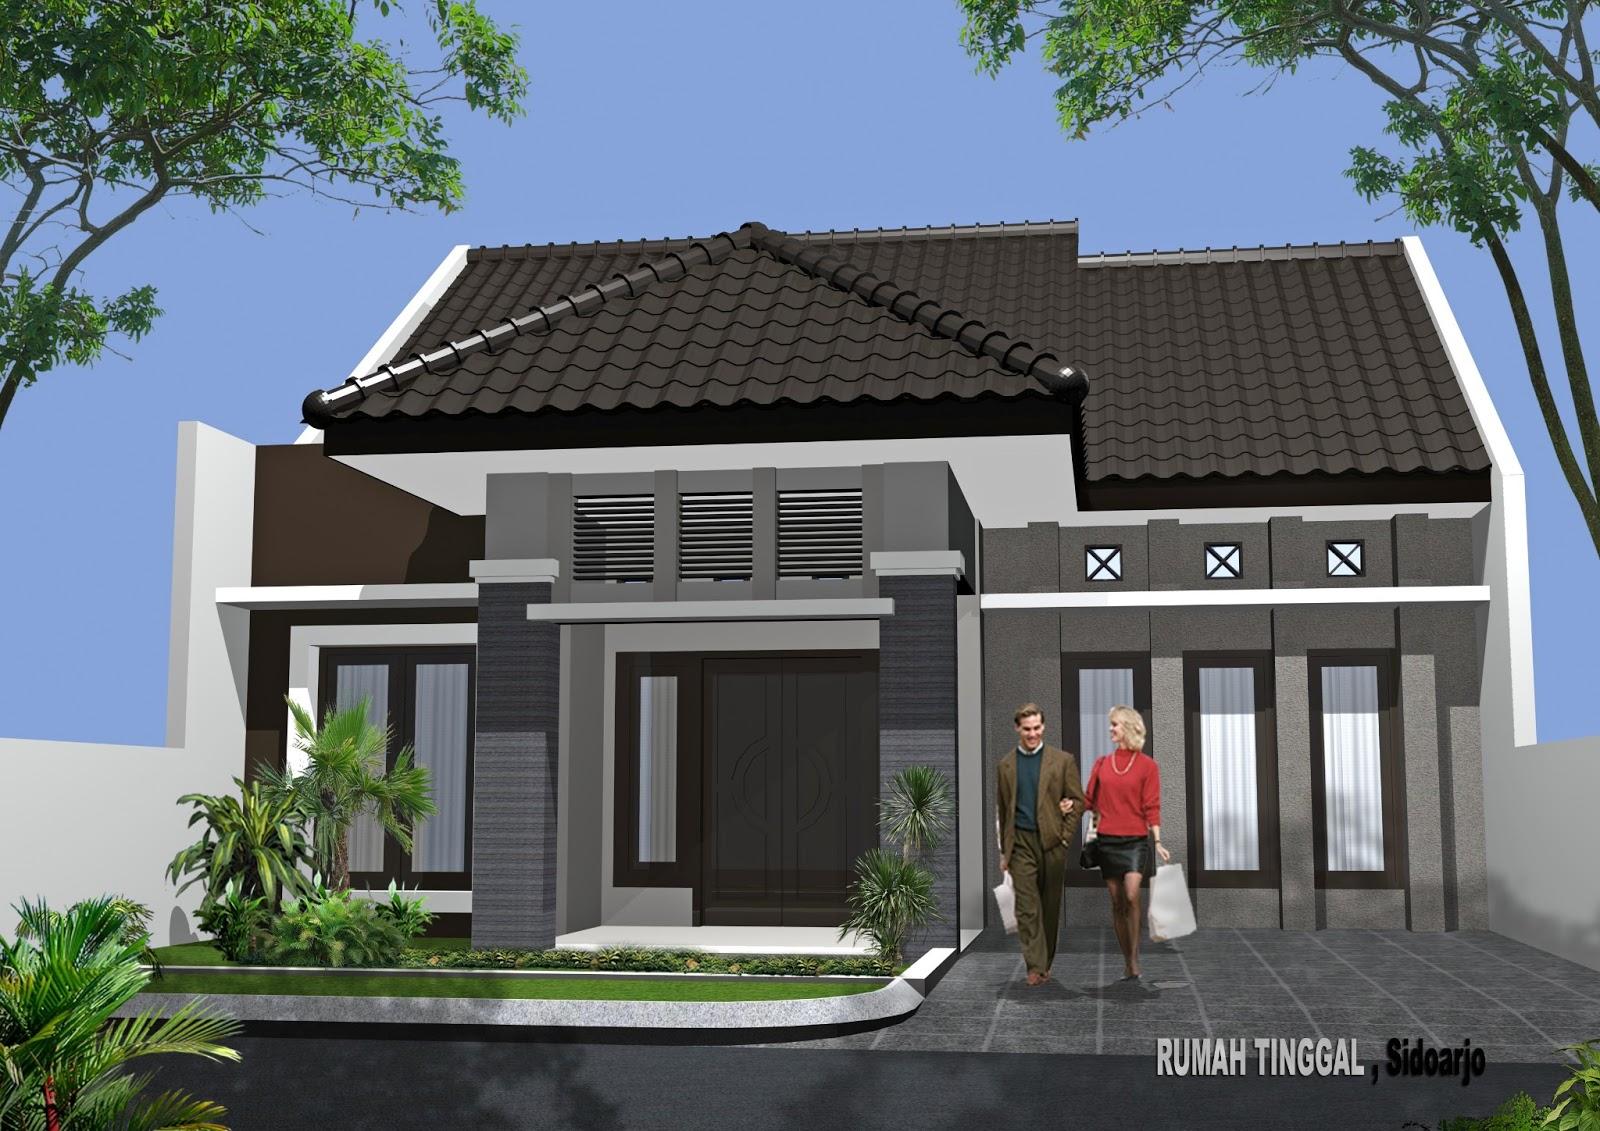 Modelo de casa minimalista mais novo modelo